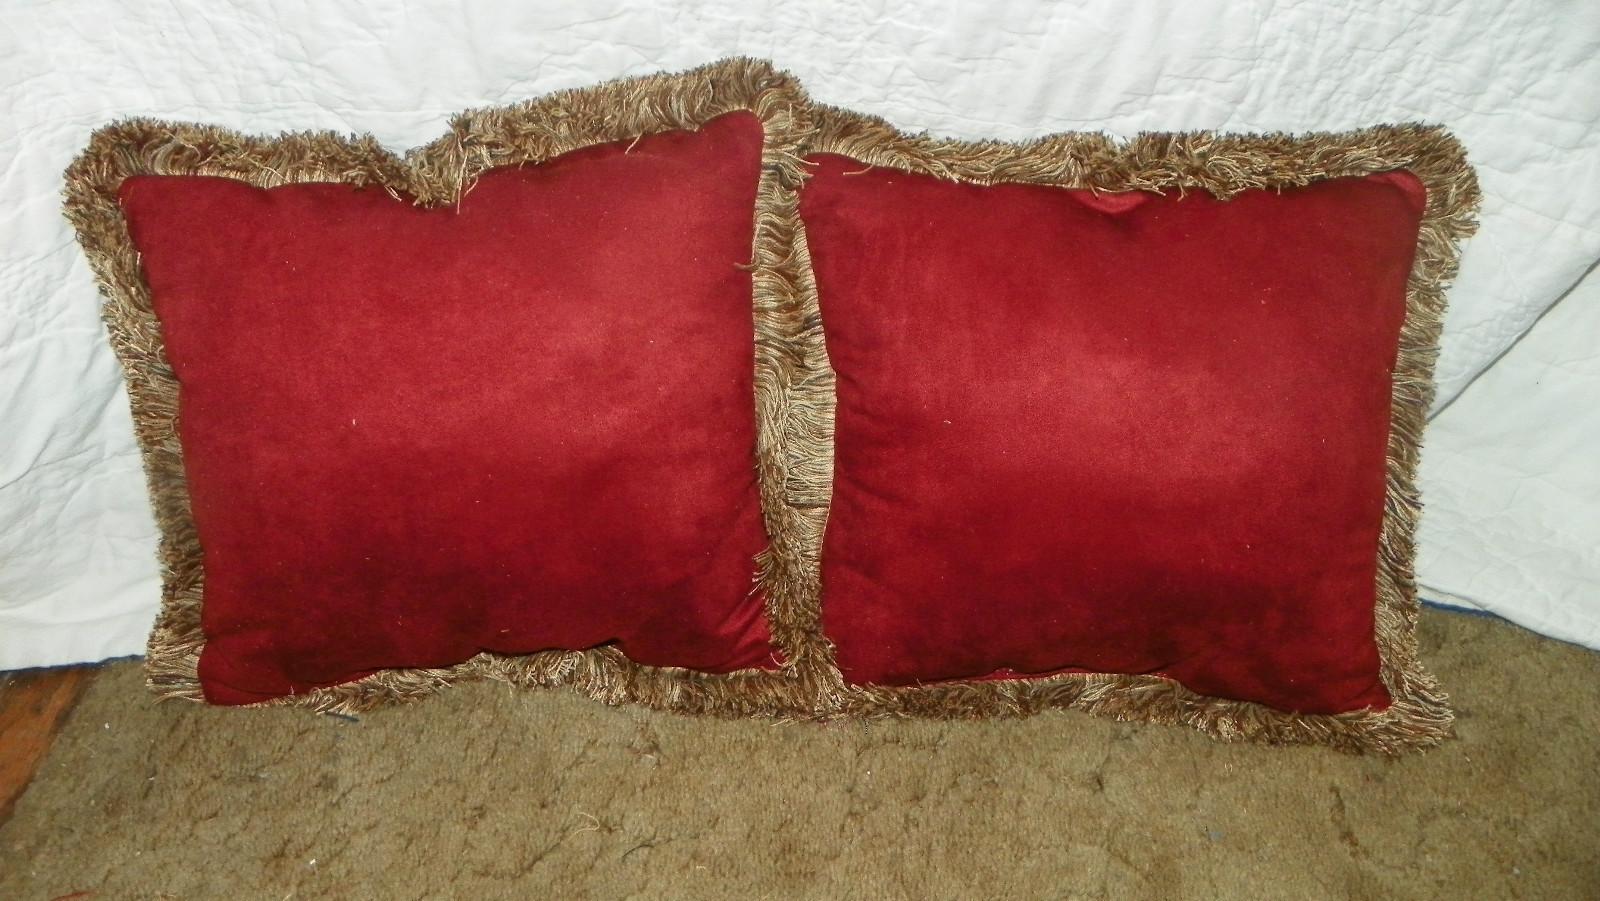 Pair Gold Russet Retro Print Pillows / Throw Pillows 15 x 15 - Pillows